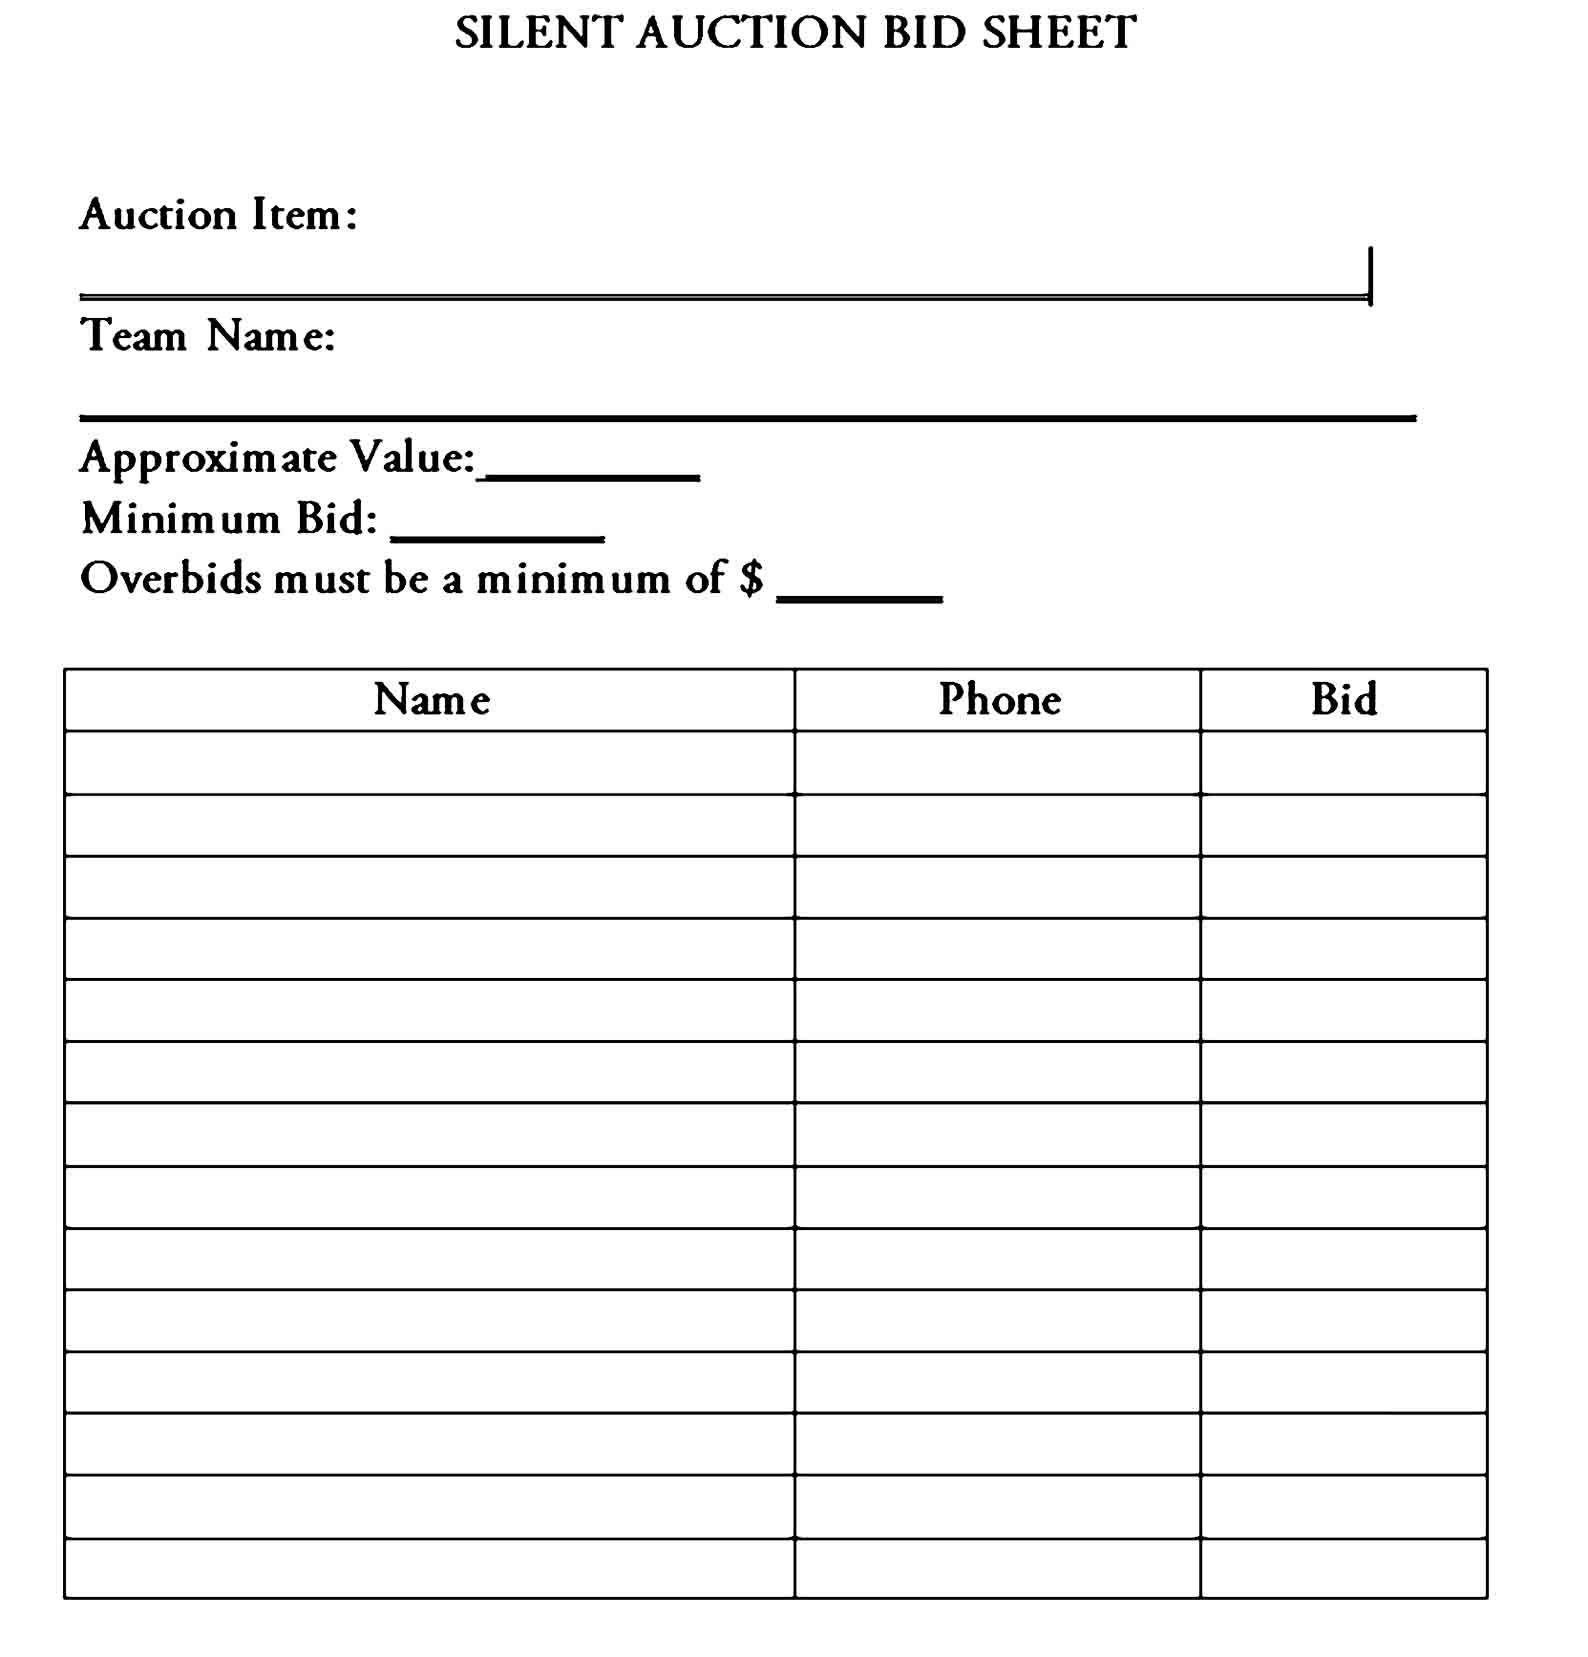 Sample Silent Auction Bid Sheet Silent Auction Bid Sheets Auction Bid Silent Auction Silent auction bid sheet template